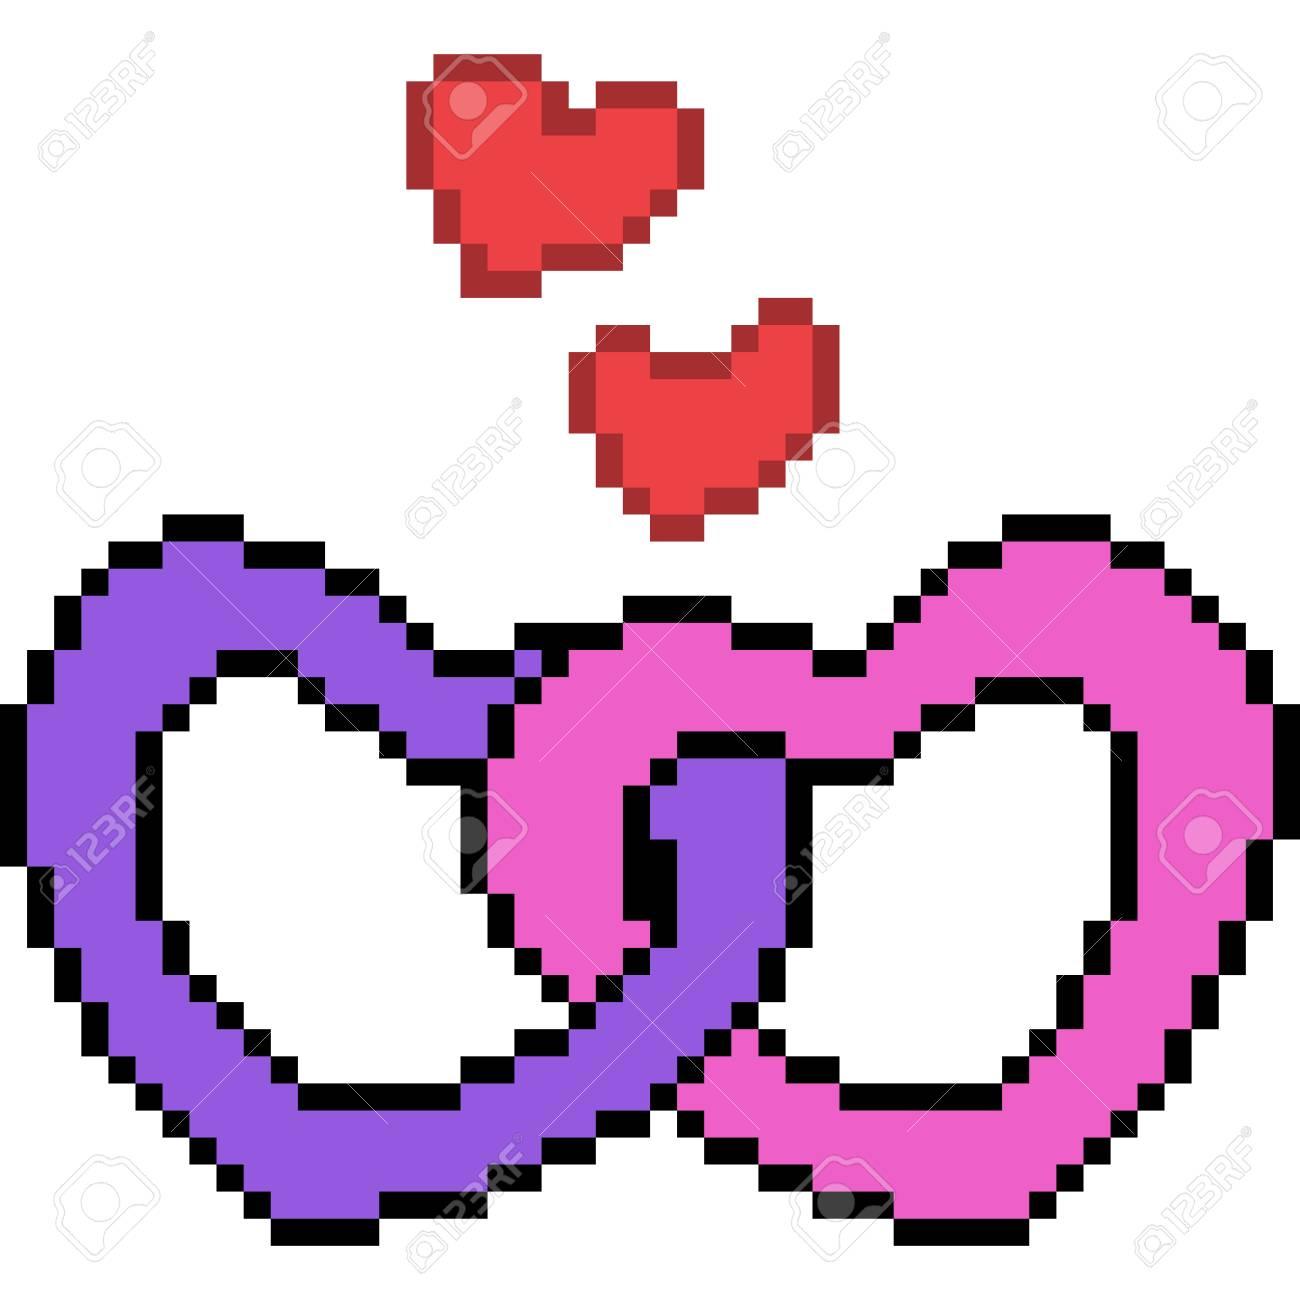 Vector Pixel Art Heart Love Isolated